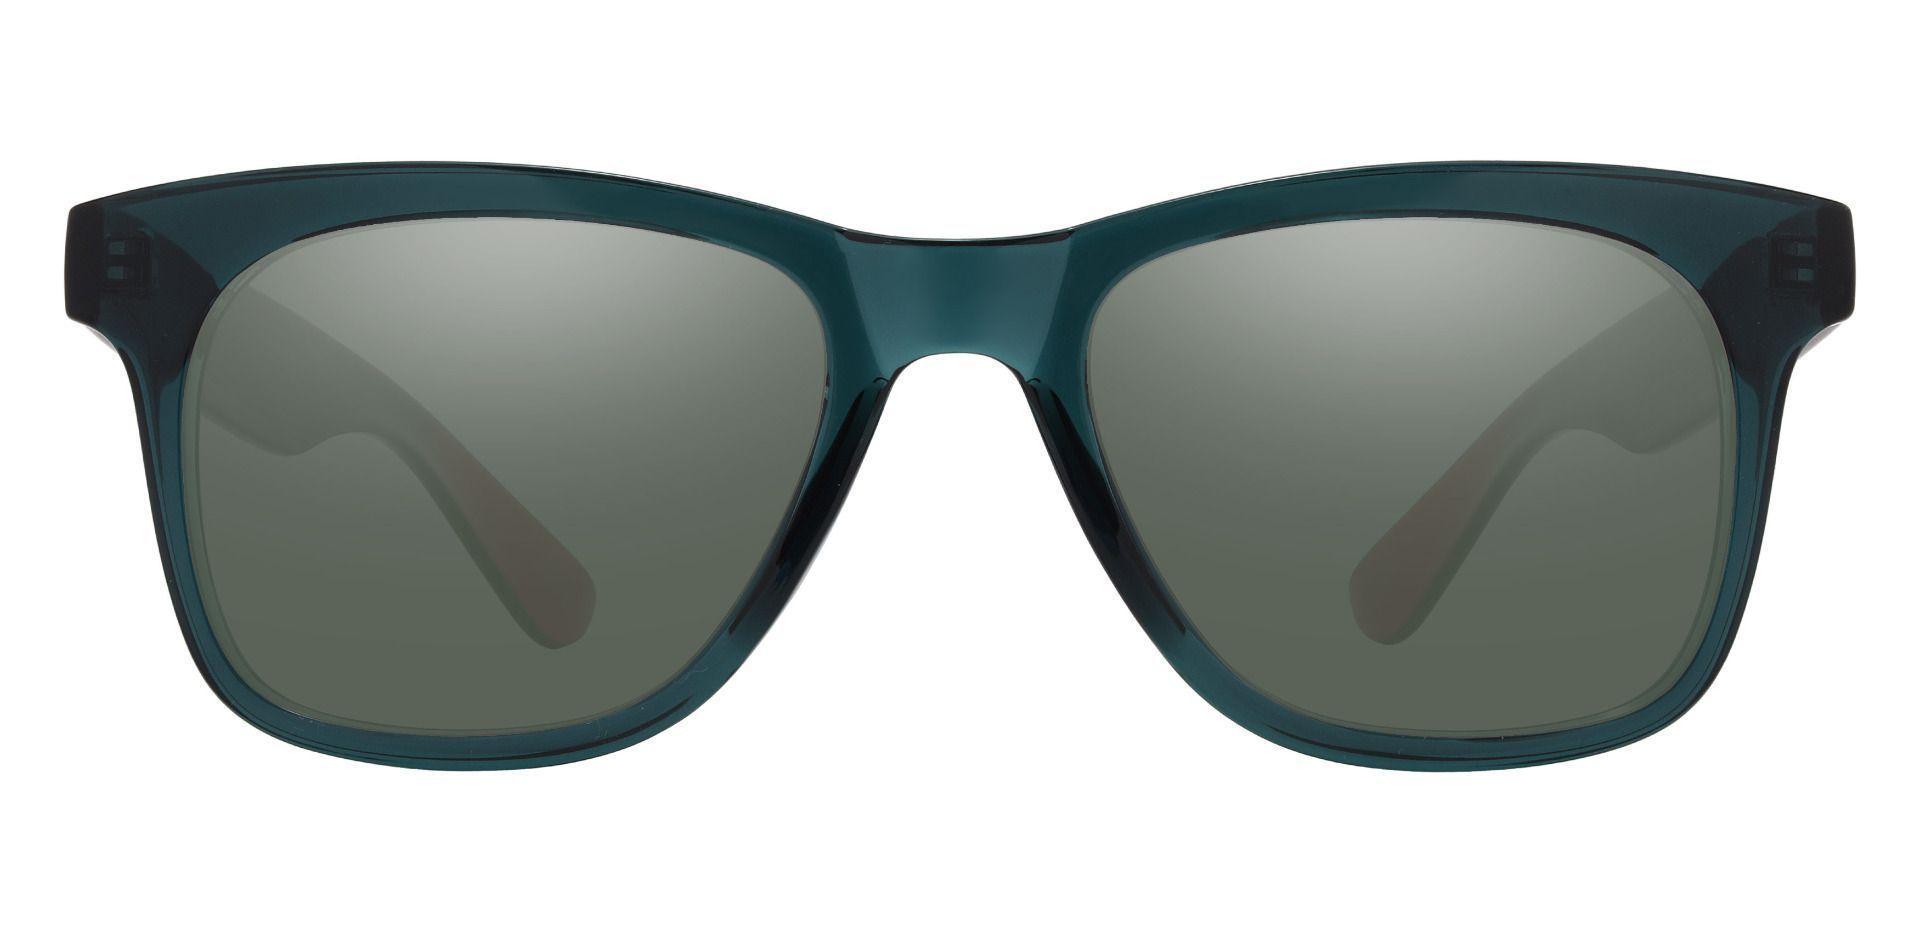 Hurley Square Prescription Sunglasses - Green Frame With Green Lenses